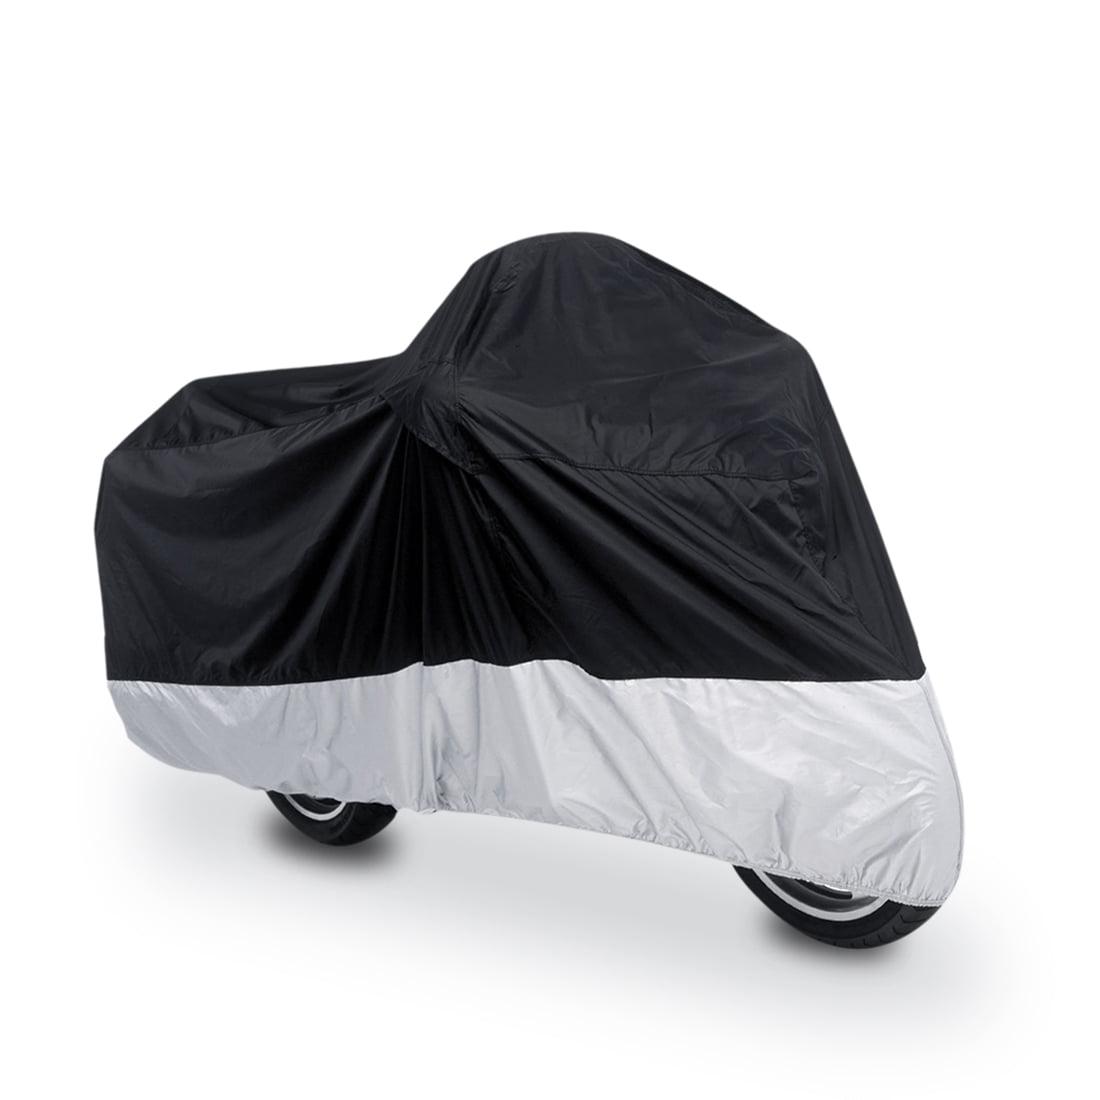 XXL 180T Black+Silver Motorcycle Cover For Kawasaki VULCAN VN 800 900 1500 1600 1700 2000